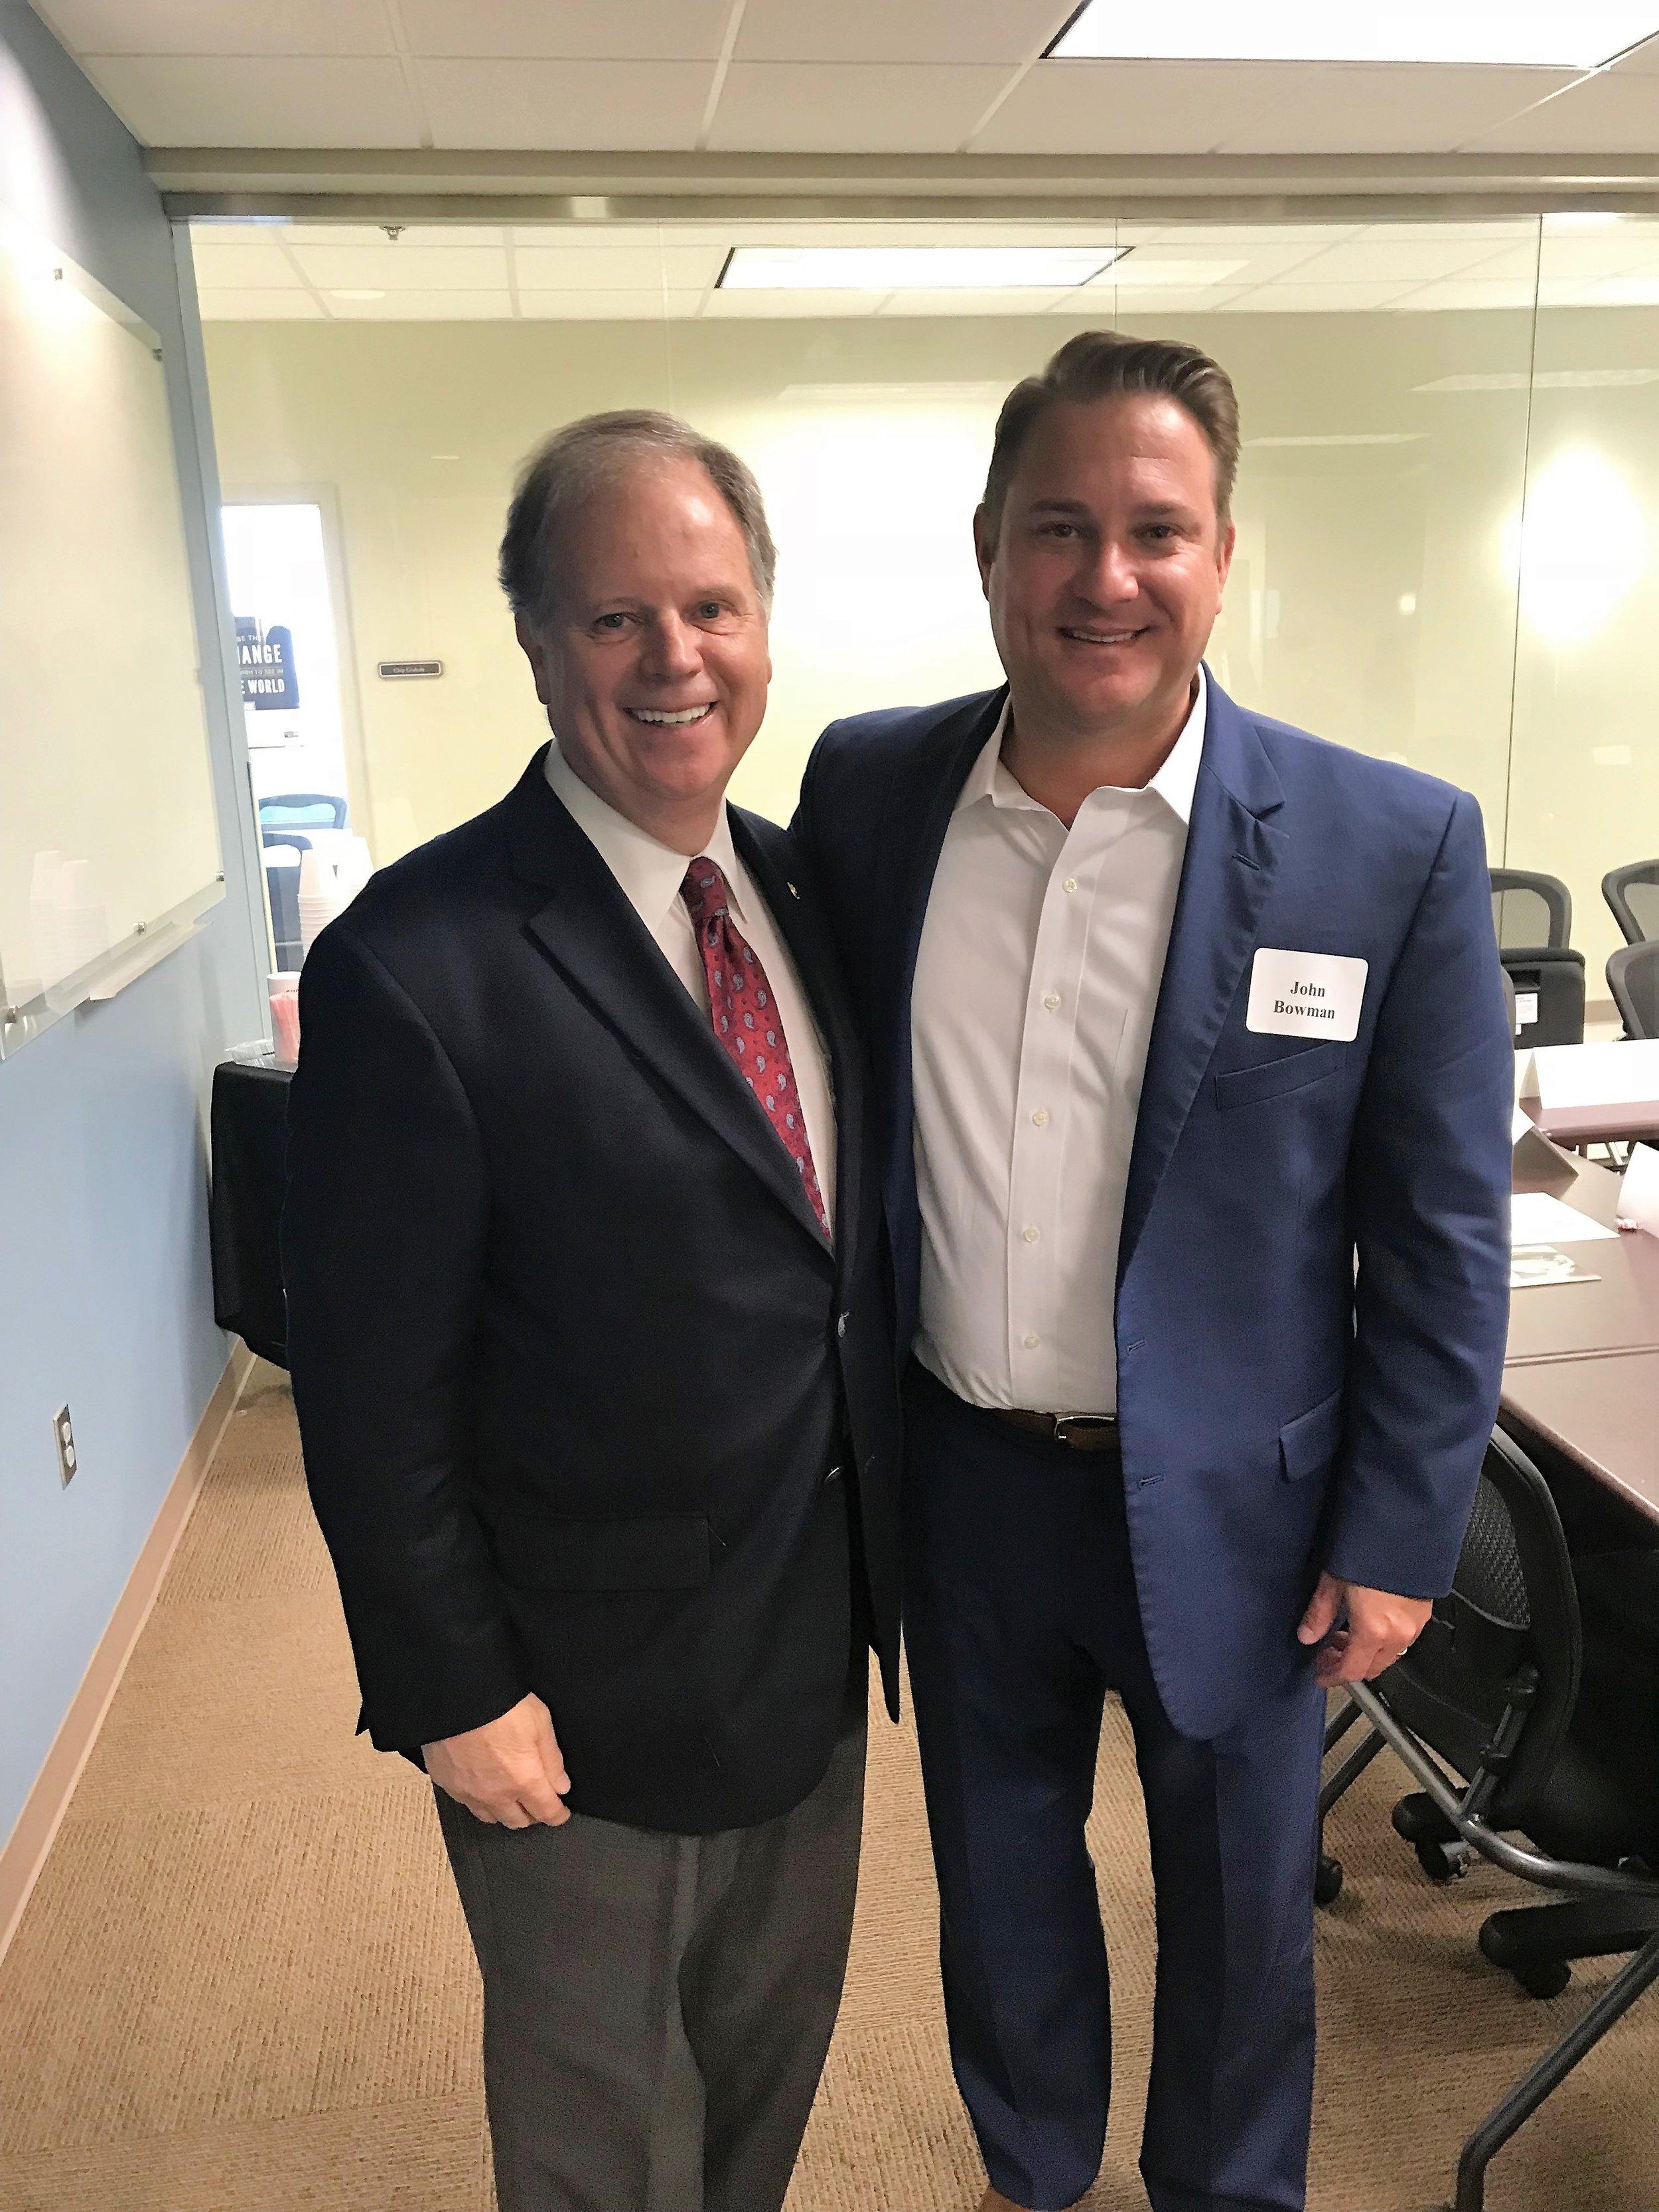 CEO John Bowman (right) meets with U.S. Senator Doug Jones (left)